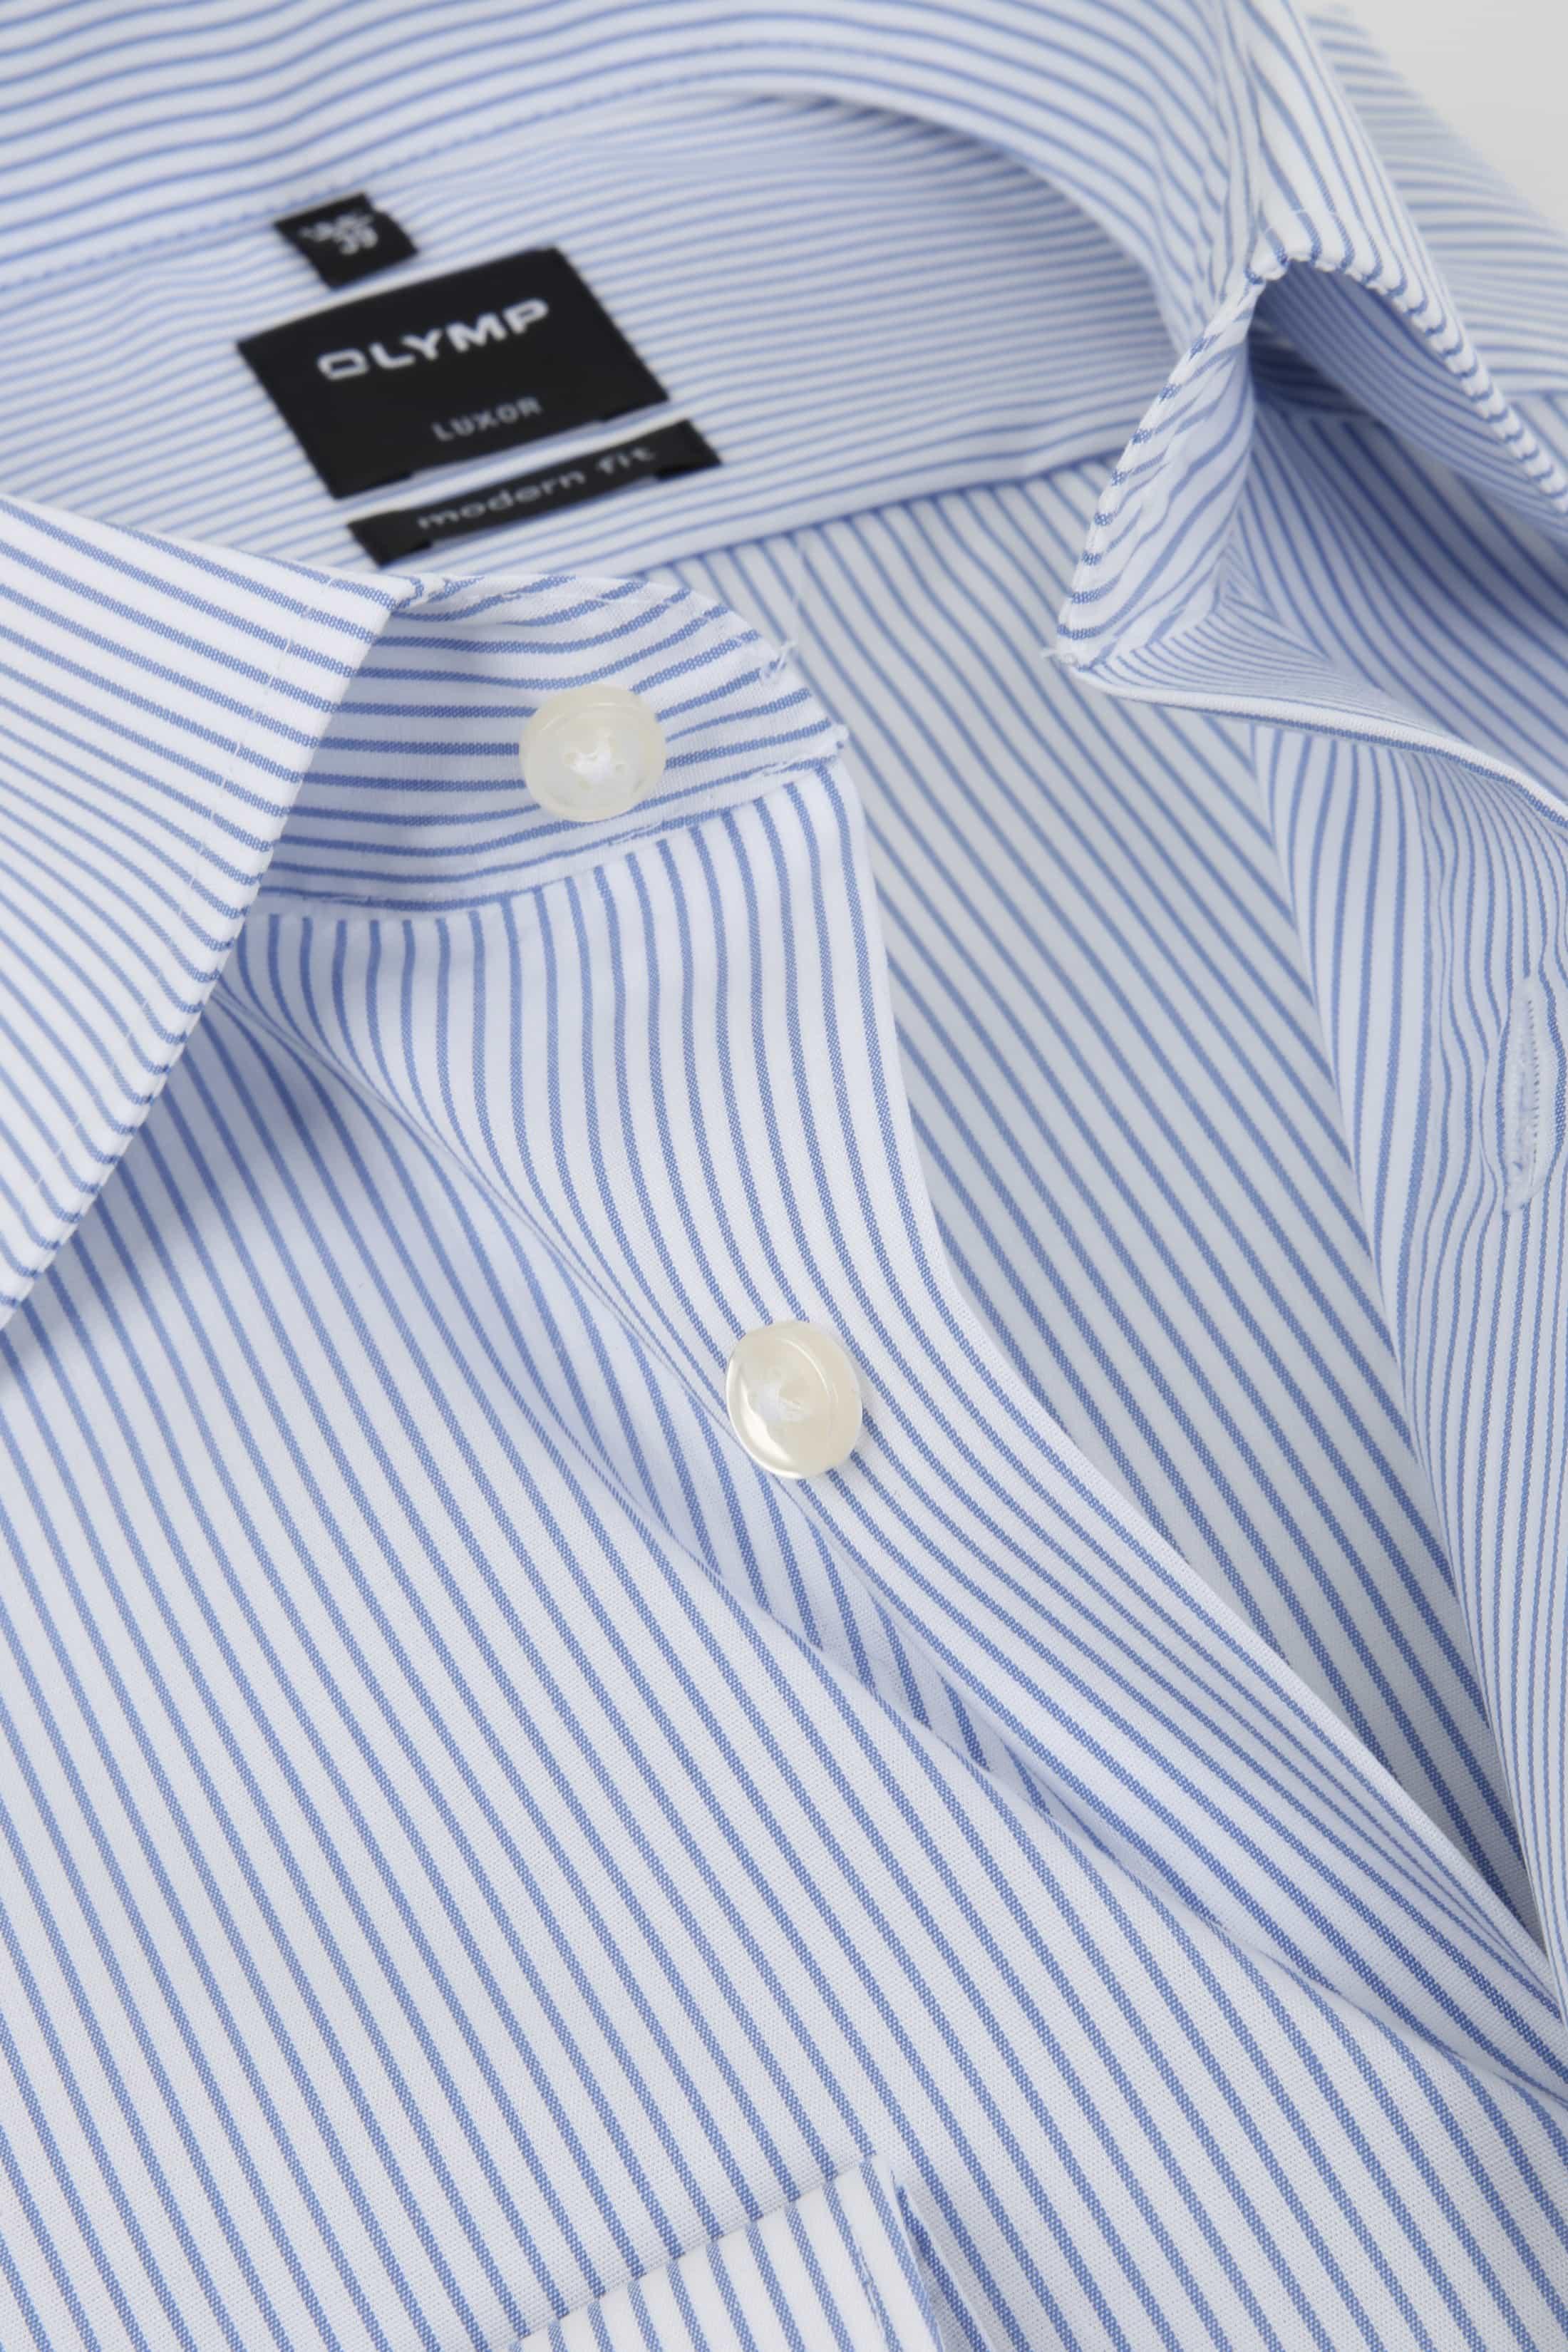 olymp luxor overhemd slim line wit blauw streep 033664. Black Bedroom Furniture Sets. Home Design Ideas